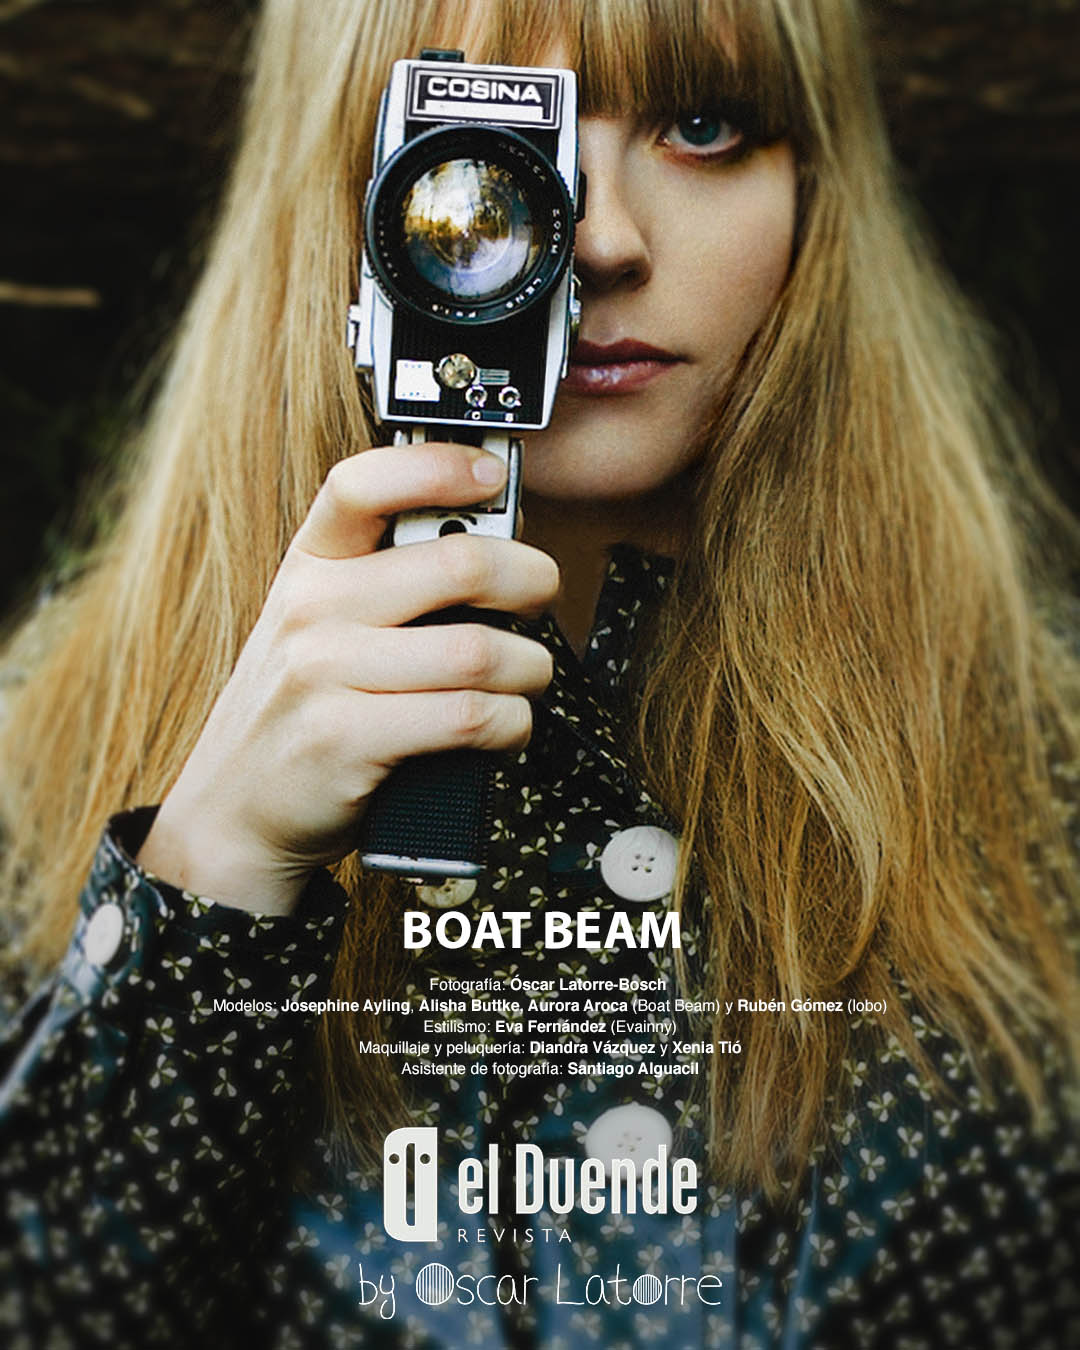 Boat Beam by Oscar Latorre